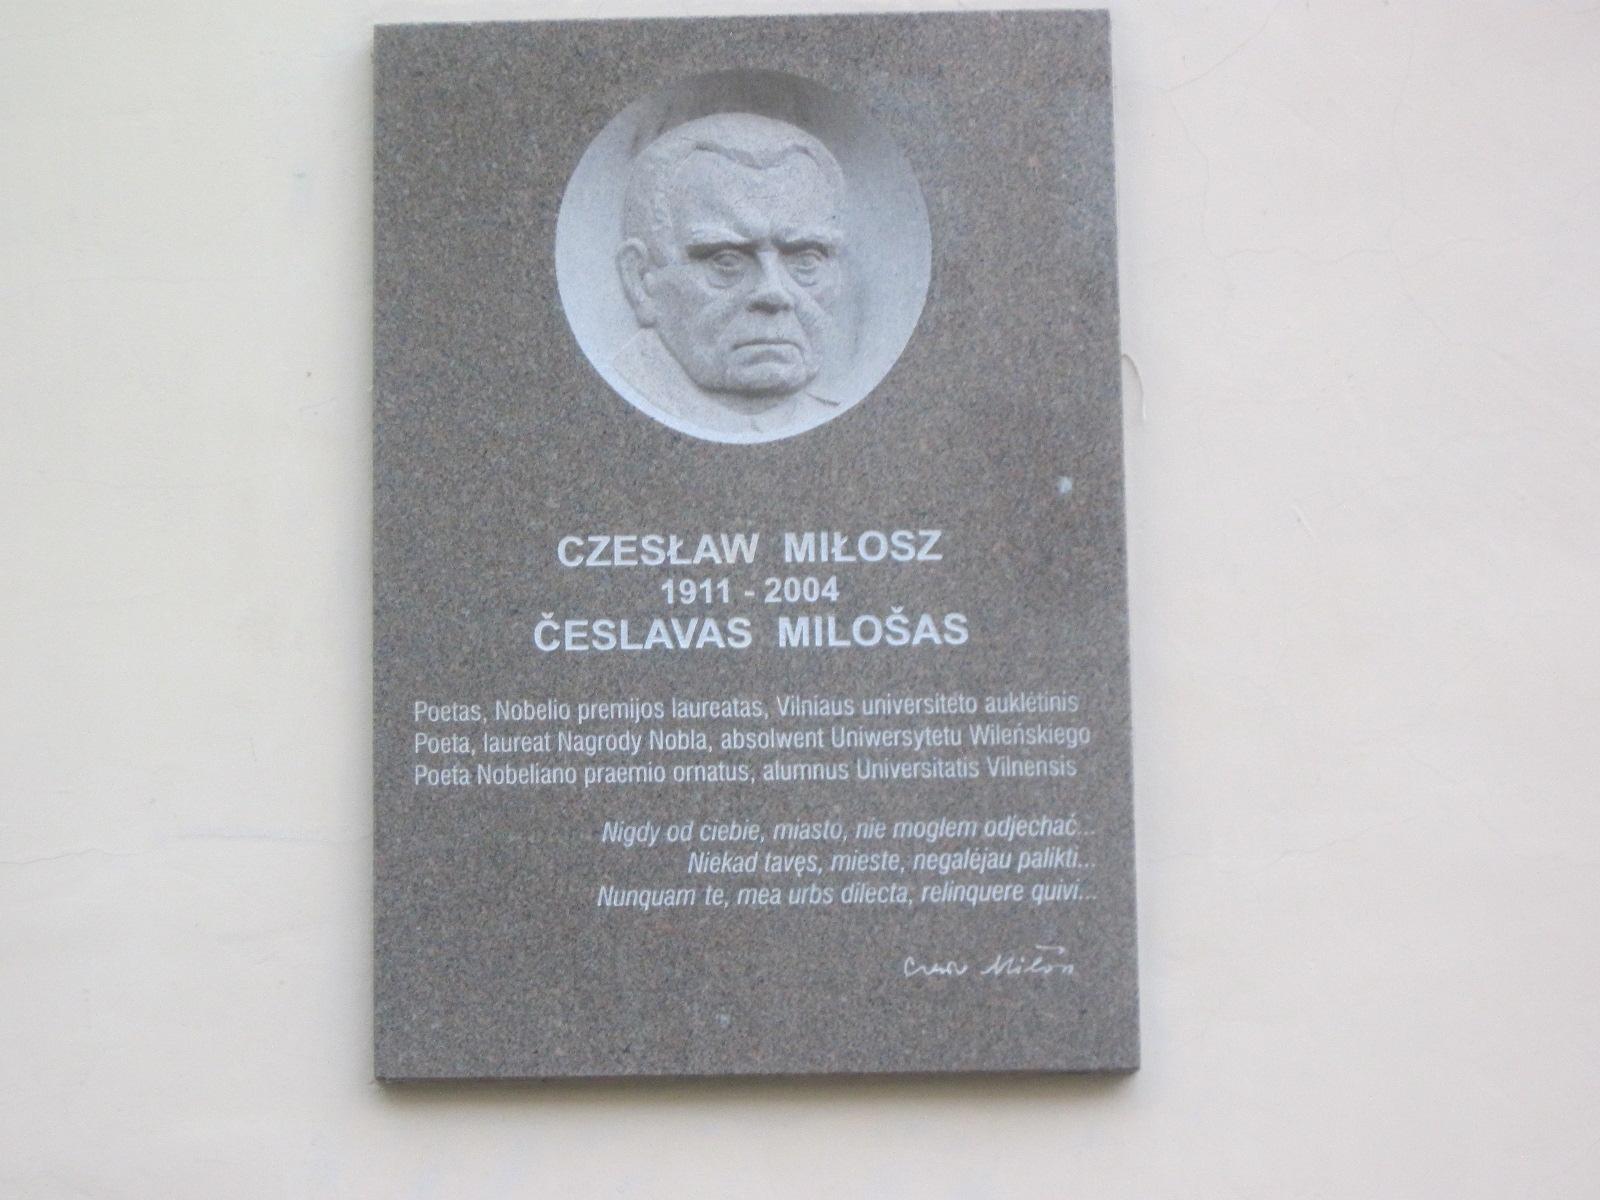 Česlovo Milošo atminimo lenta Vilniaus universiteto Filologijos kieme | P. S. Krivicko archyvo nuotr.